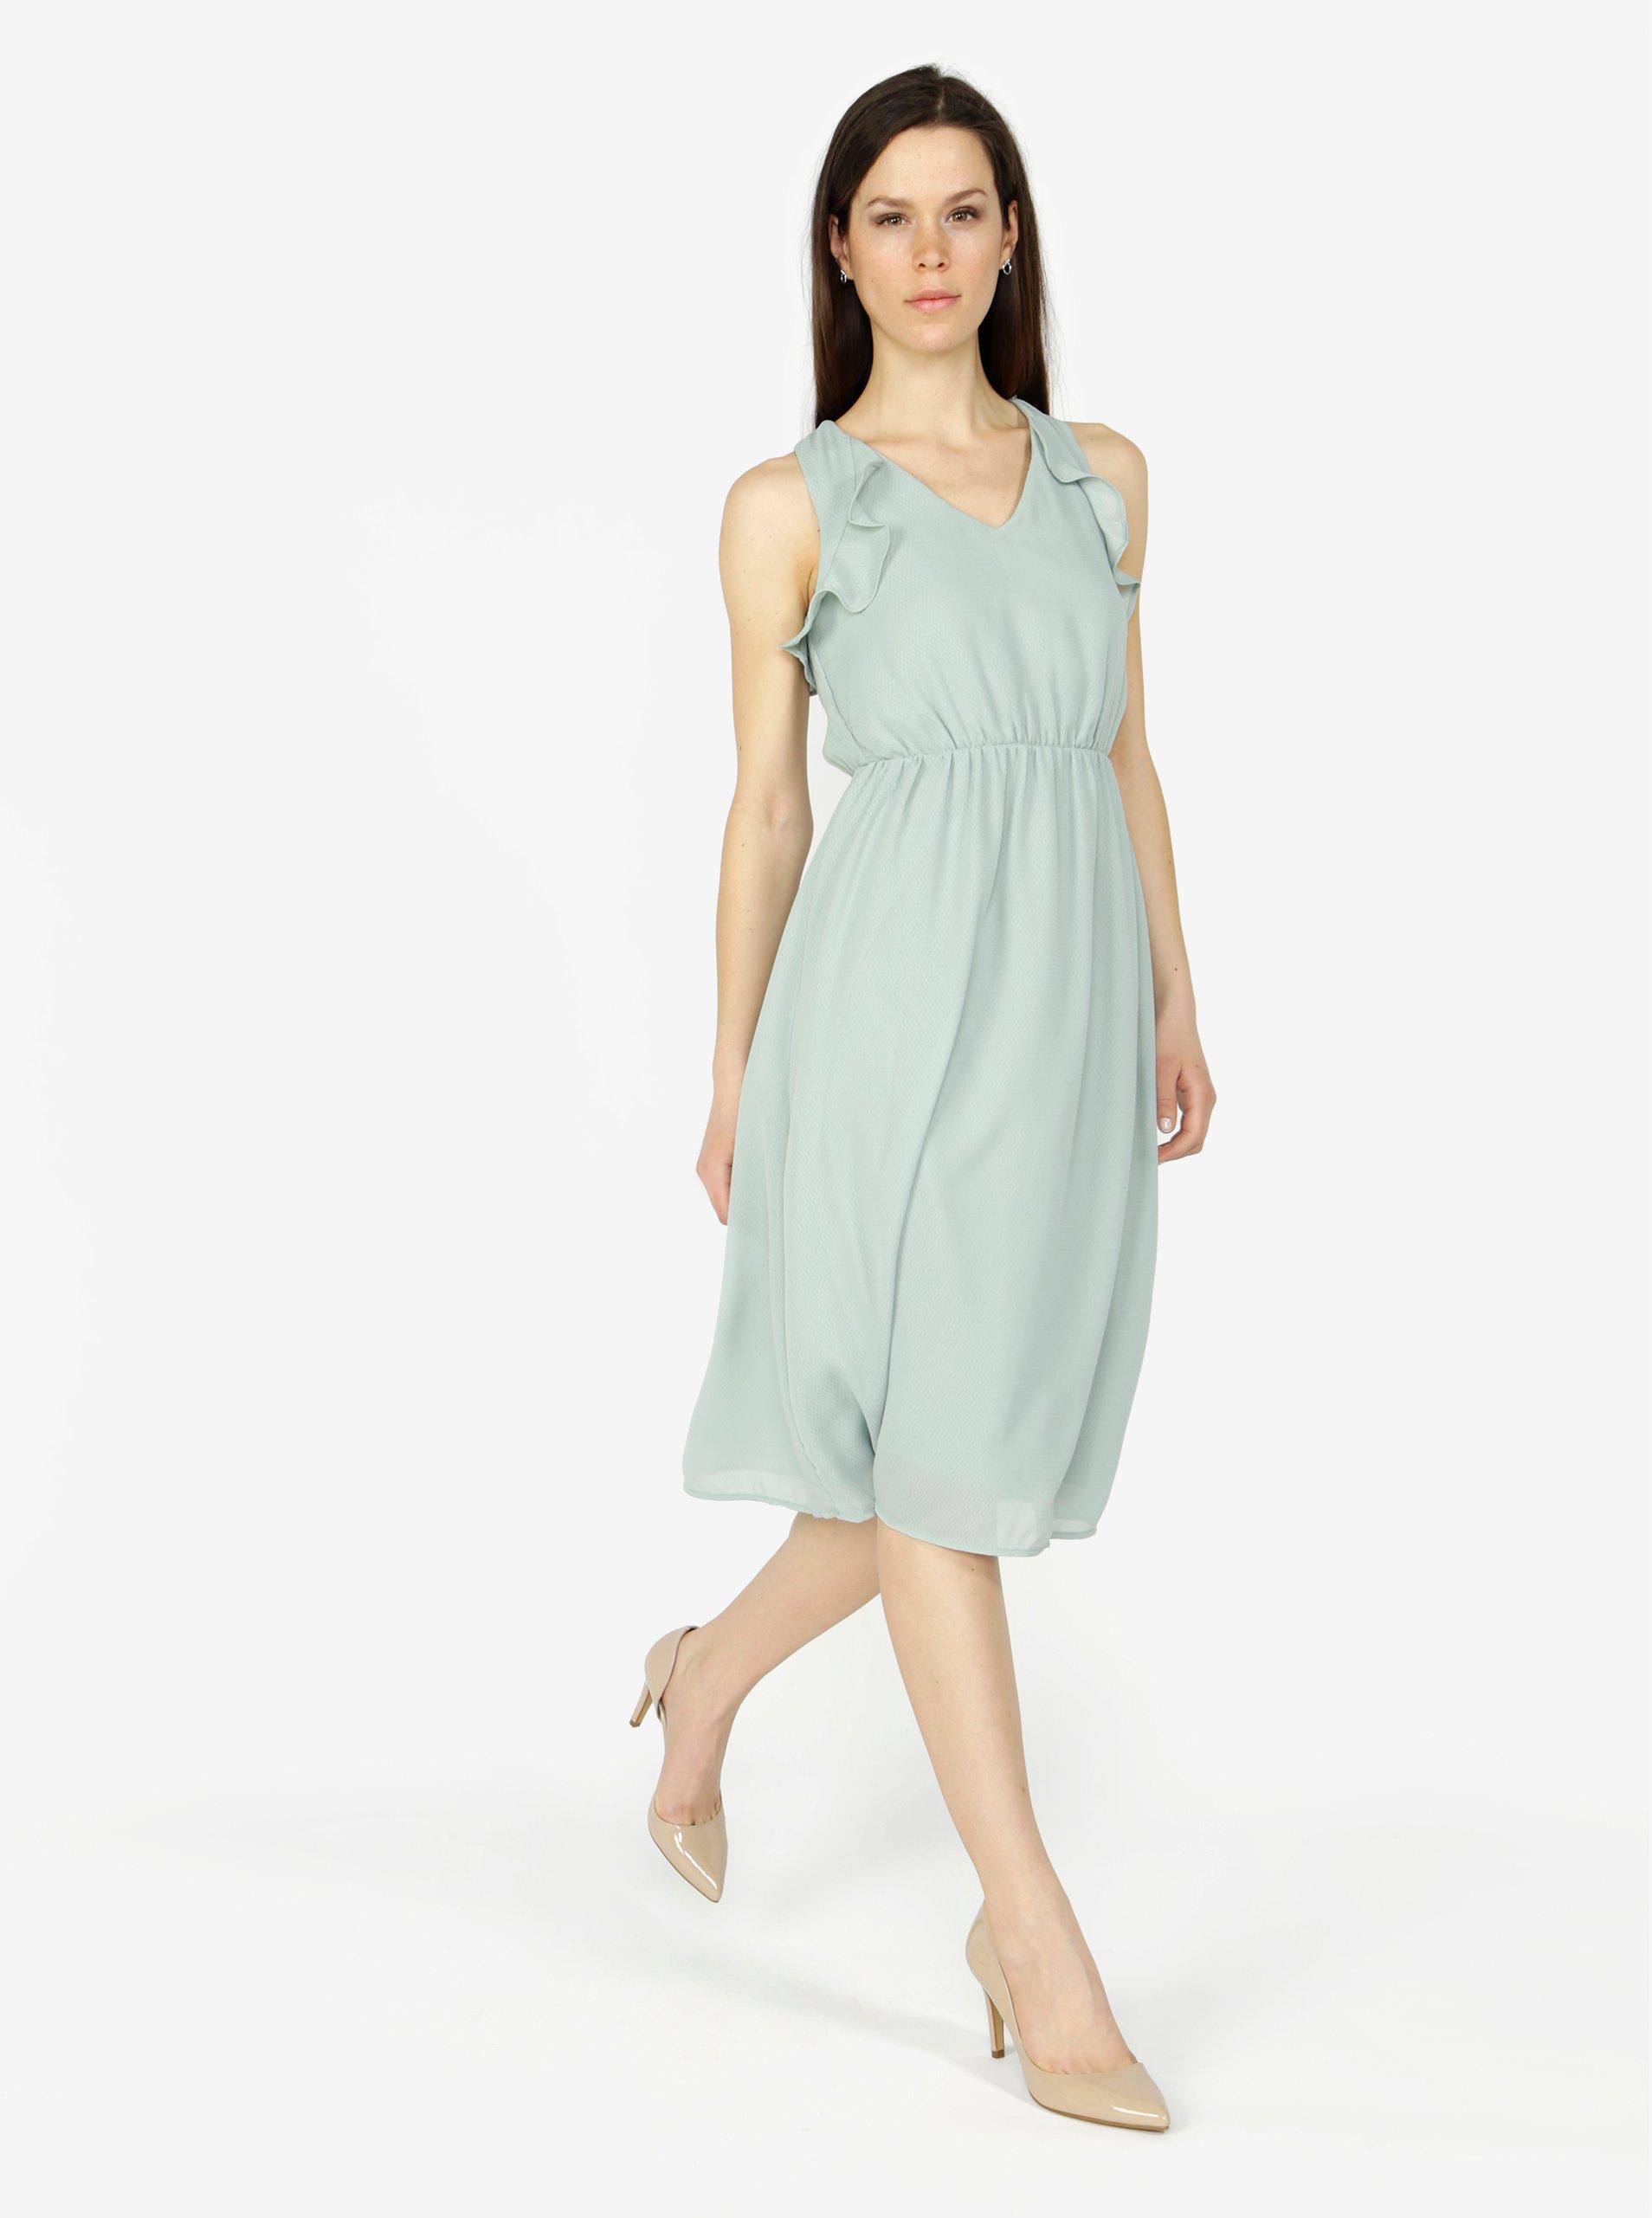 5d6af2617f5 Mentolové šaty s volány VERO MODA Iris